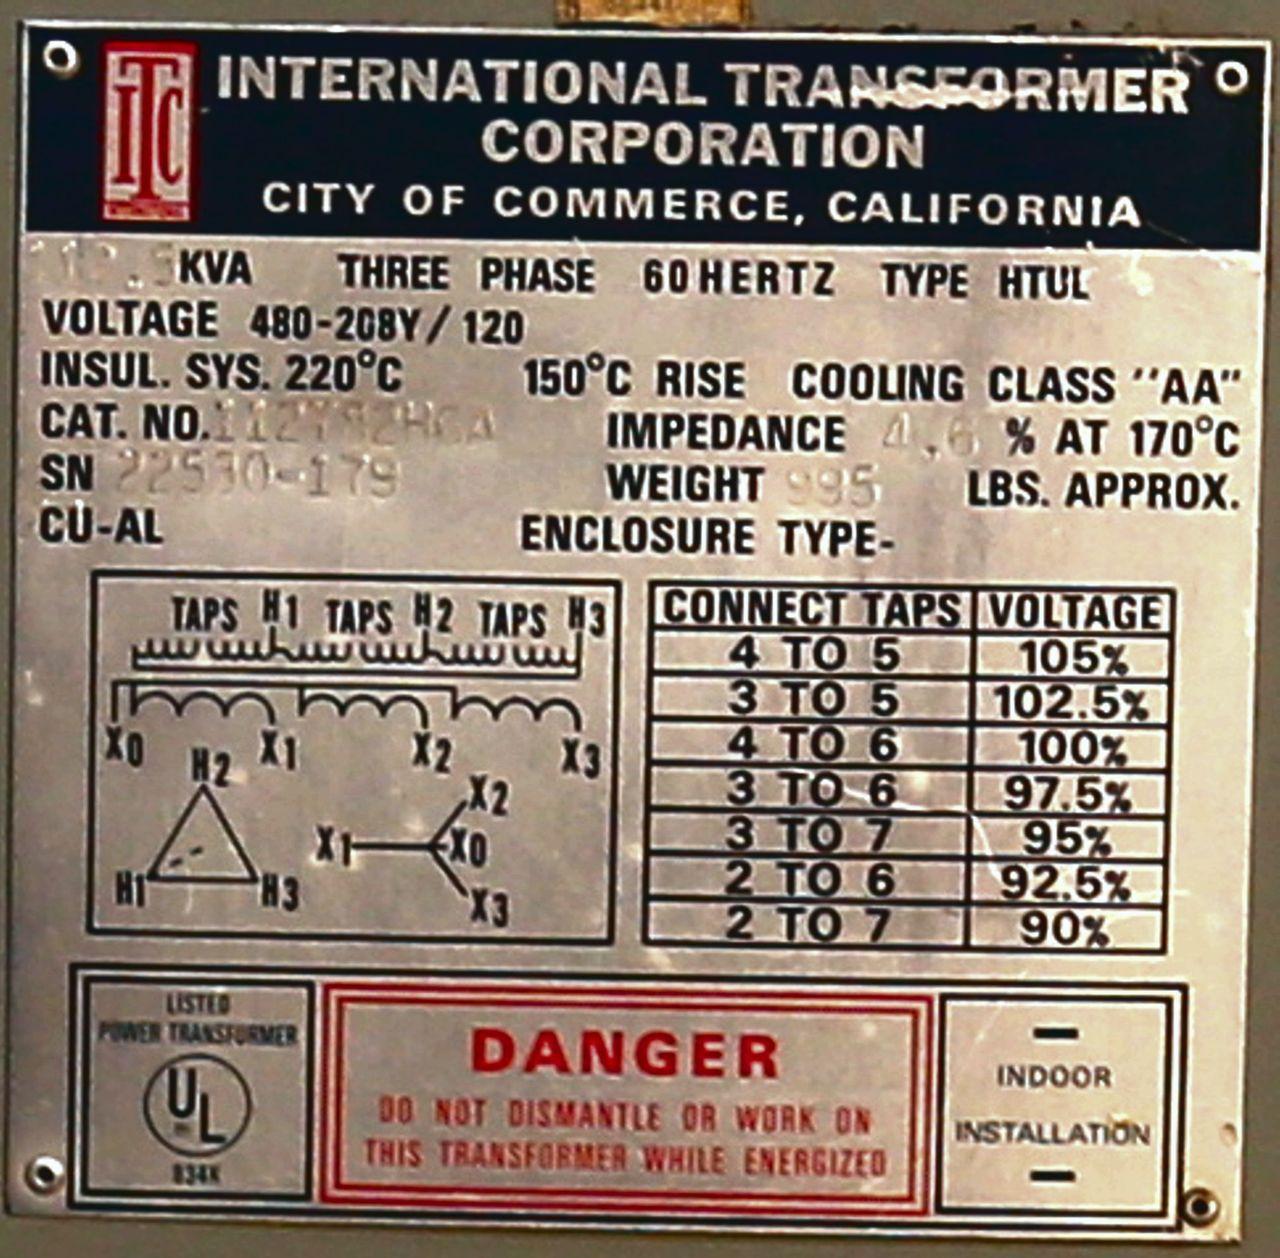 112.5 kVA  ITC Transformer 112T82H6A